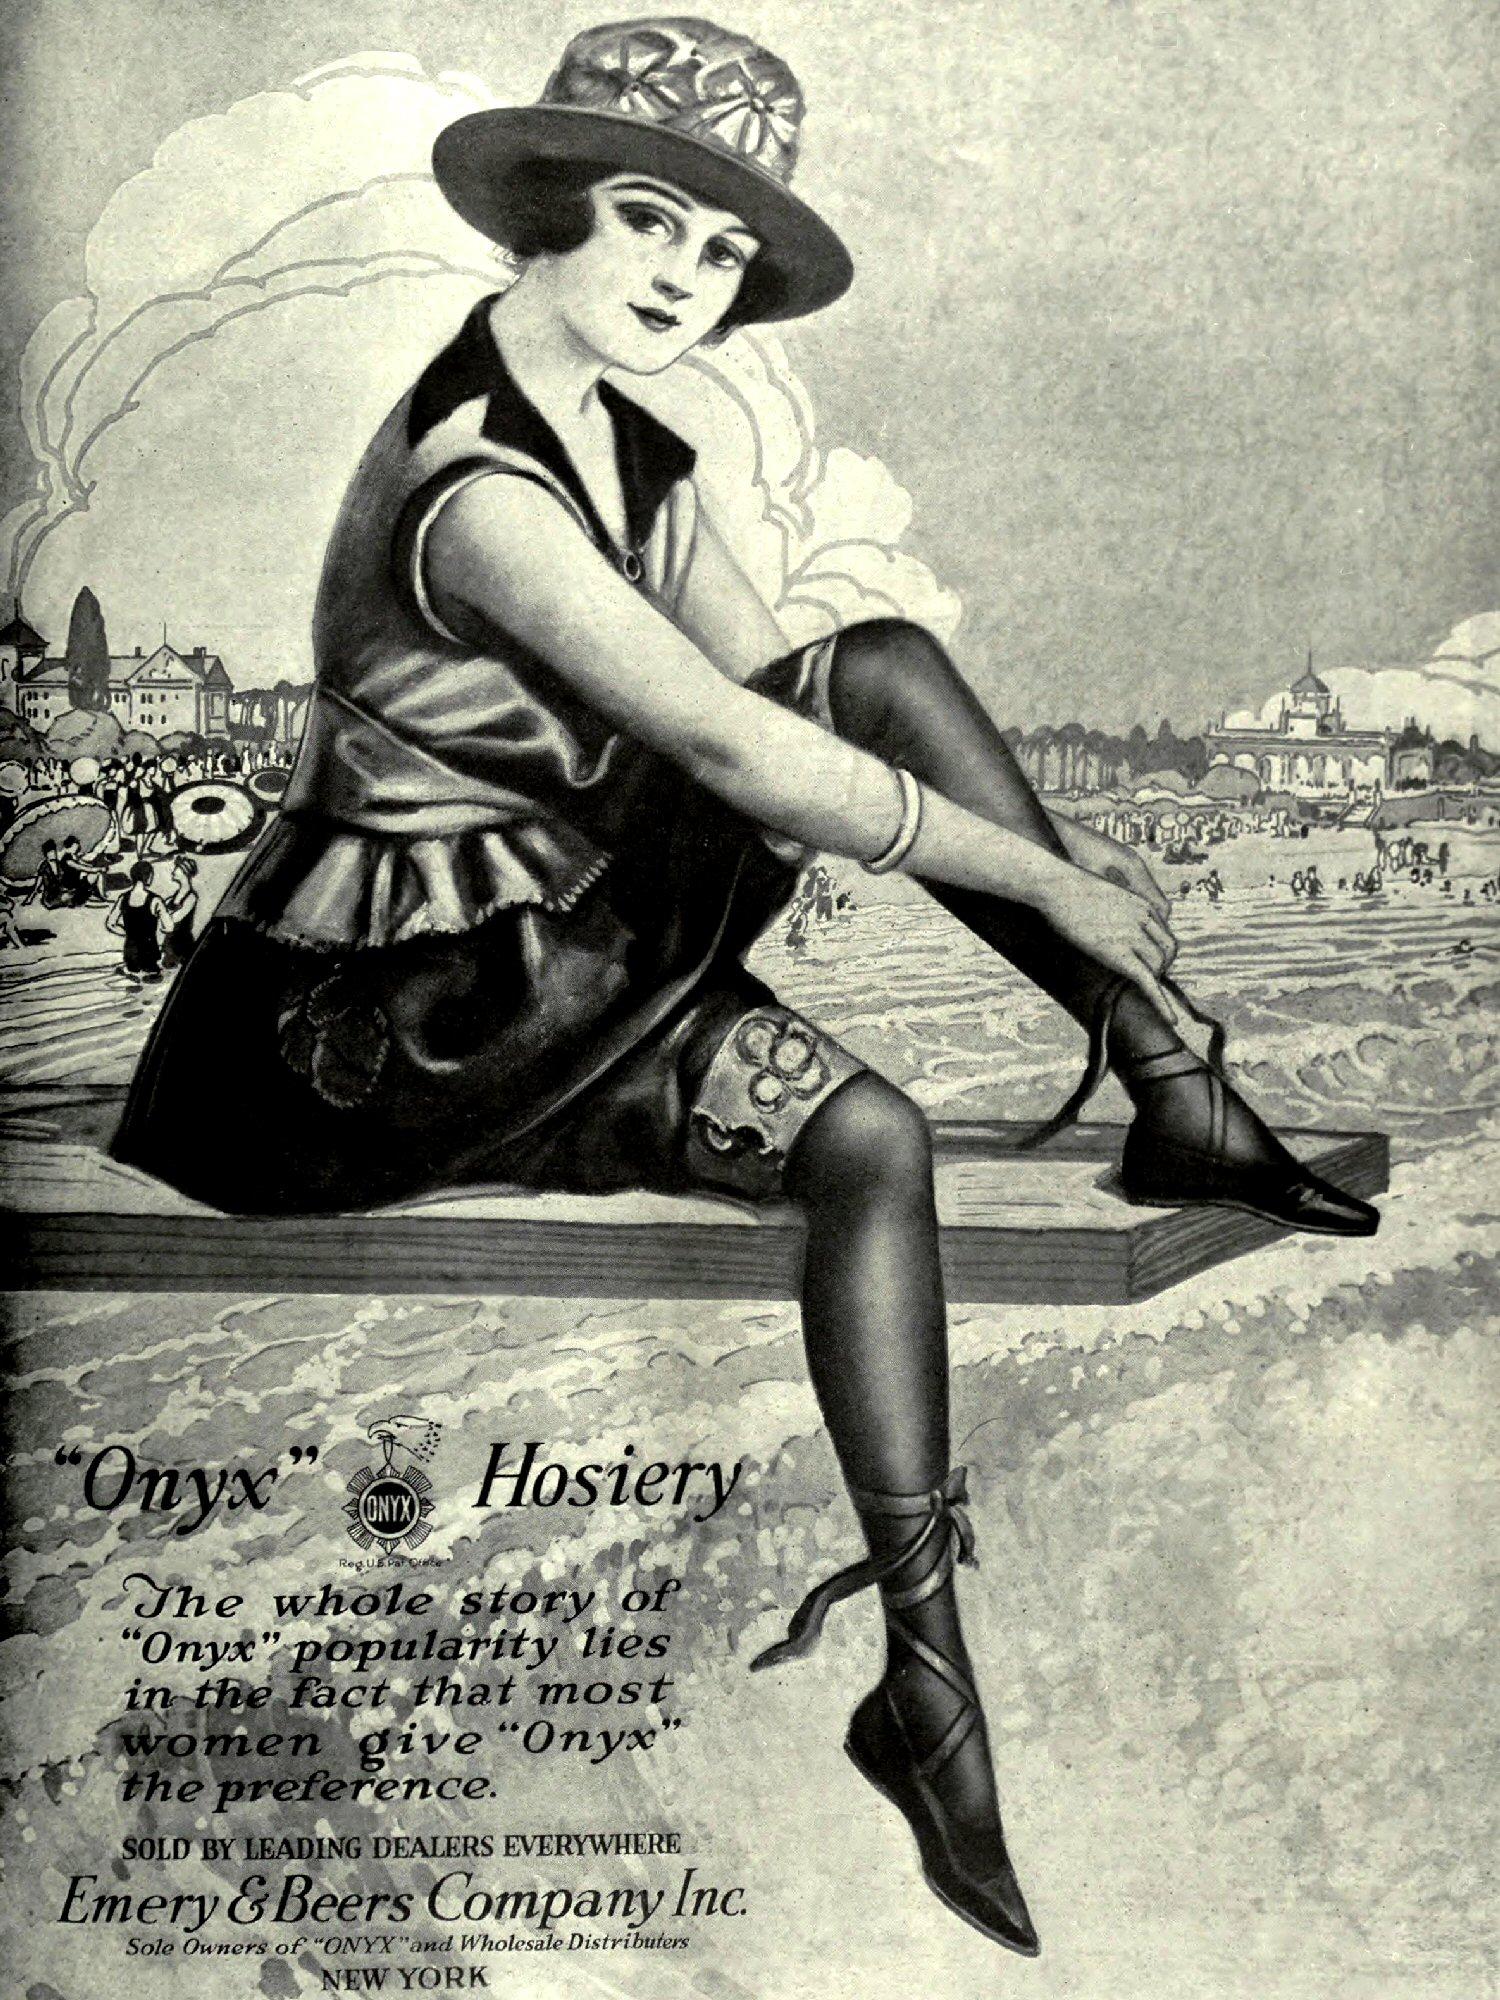 Vintage nylon pictures